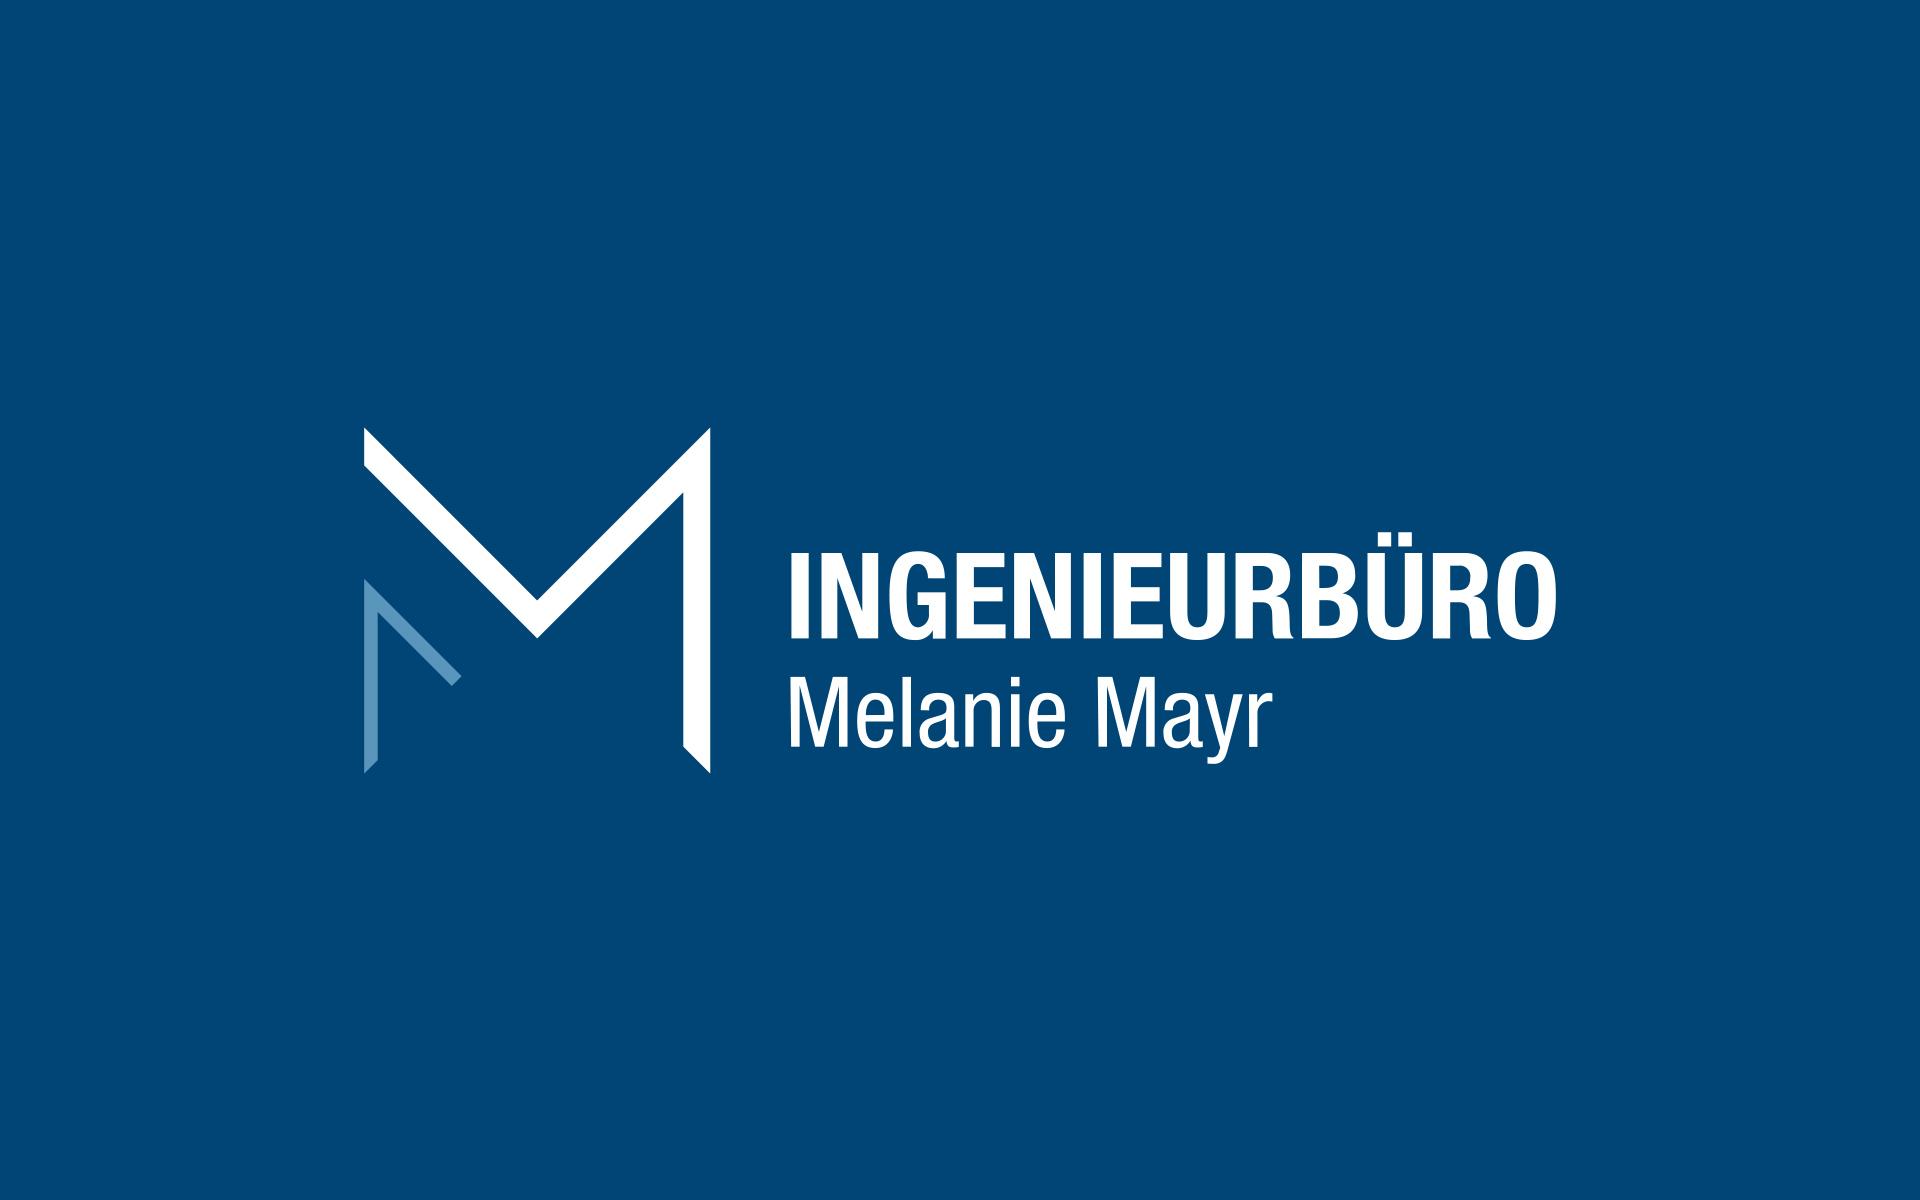 maxfath-ingenieurbuero-melanie-mayr-mering-branding-logo-horizontal-weiss